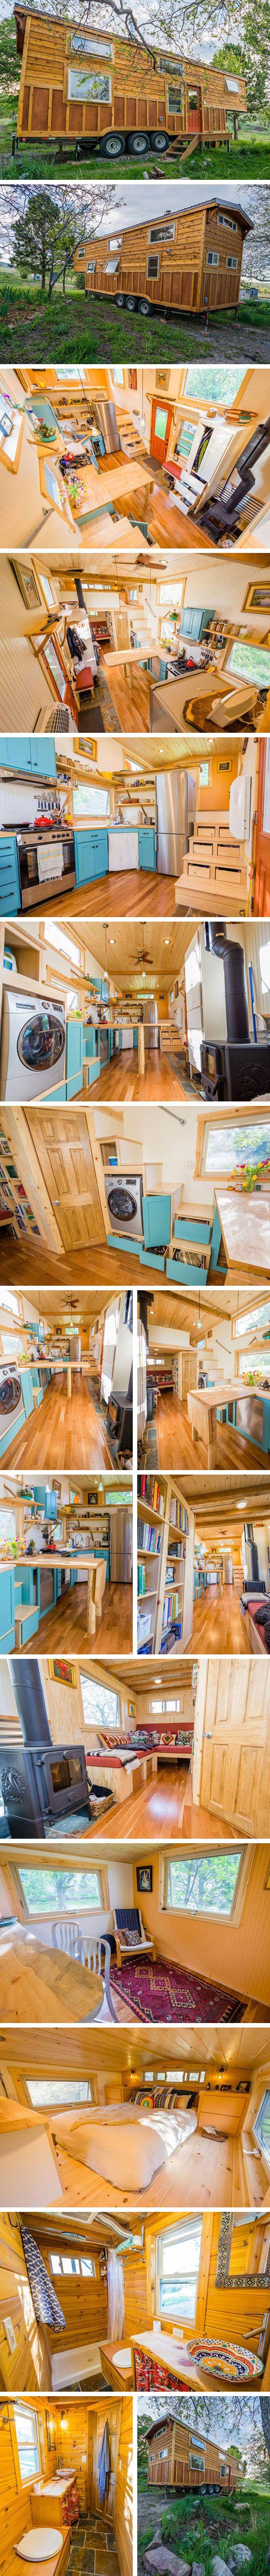 Дом на колесах Eric & Oliver от MitchCraft Tiny Homes #tinyhomesdigest #tinyhouse #houseonwheels #camper